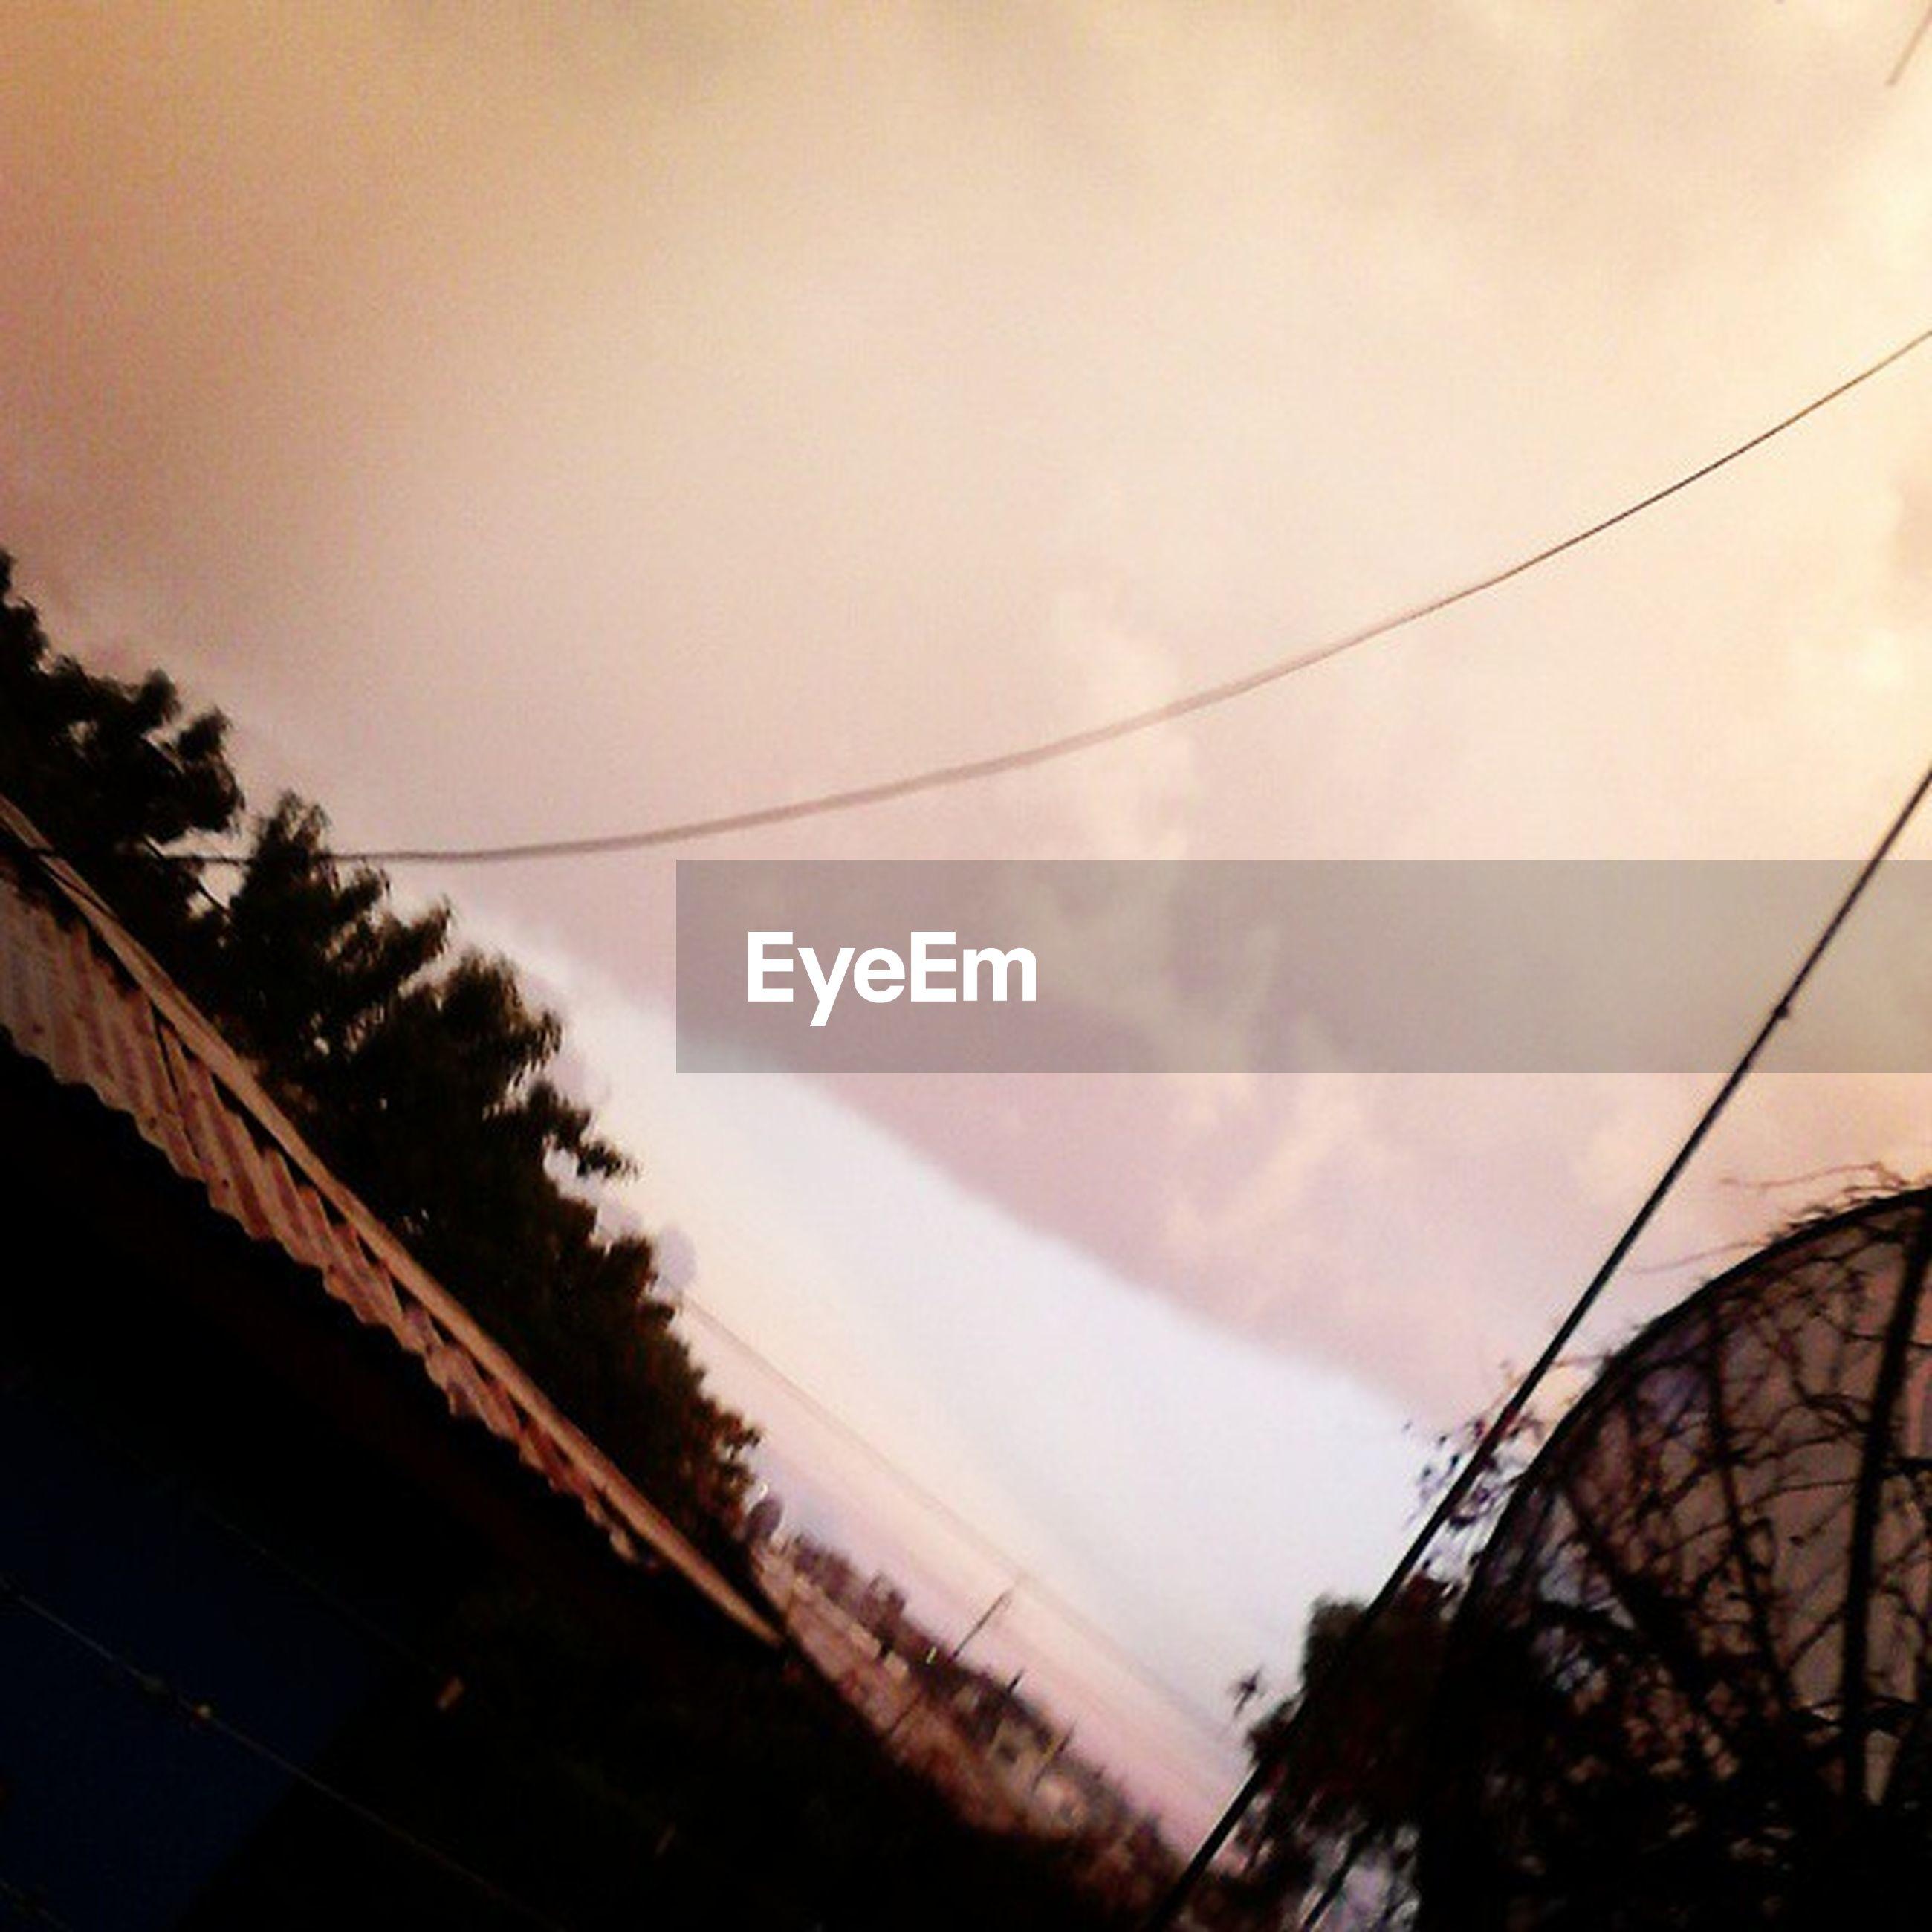 sky, low angle view, power line, built structure, cloud - sky, architecture, dusk, building exterior, silhouette, cable, tree, outdoors, sunset, nature, cloudy, connection, cloud, no people, electricity pylon, transportation